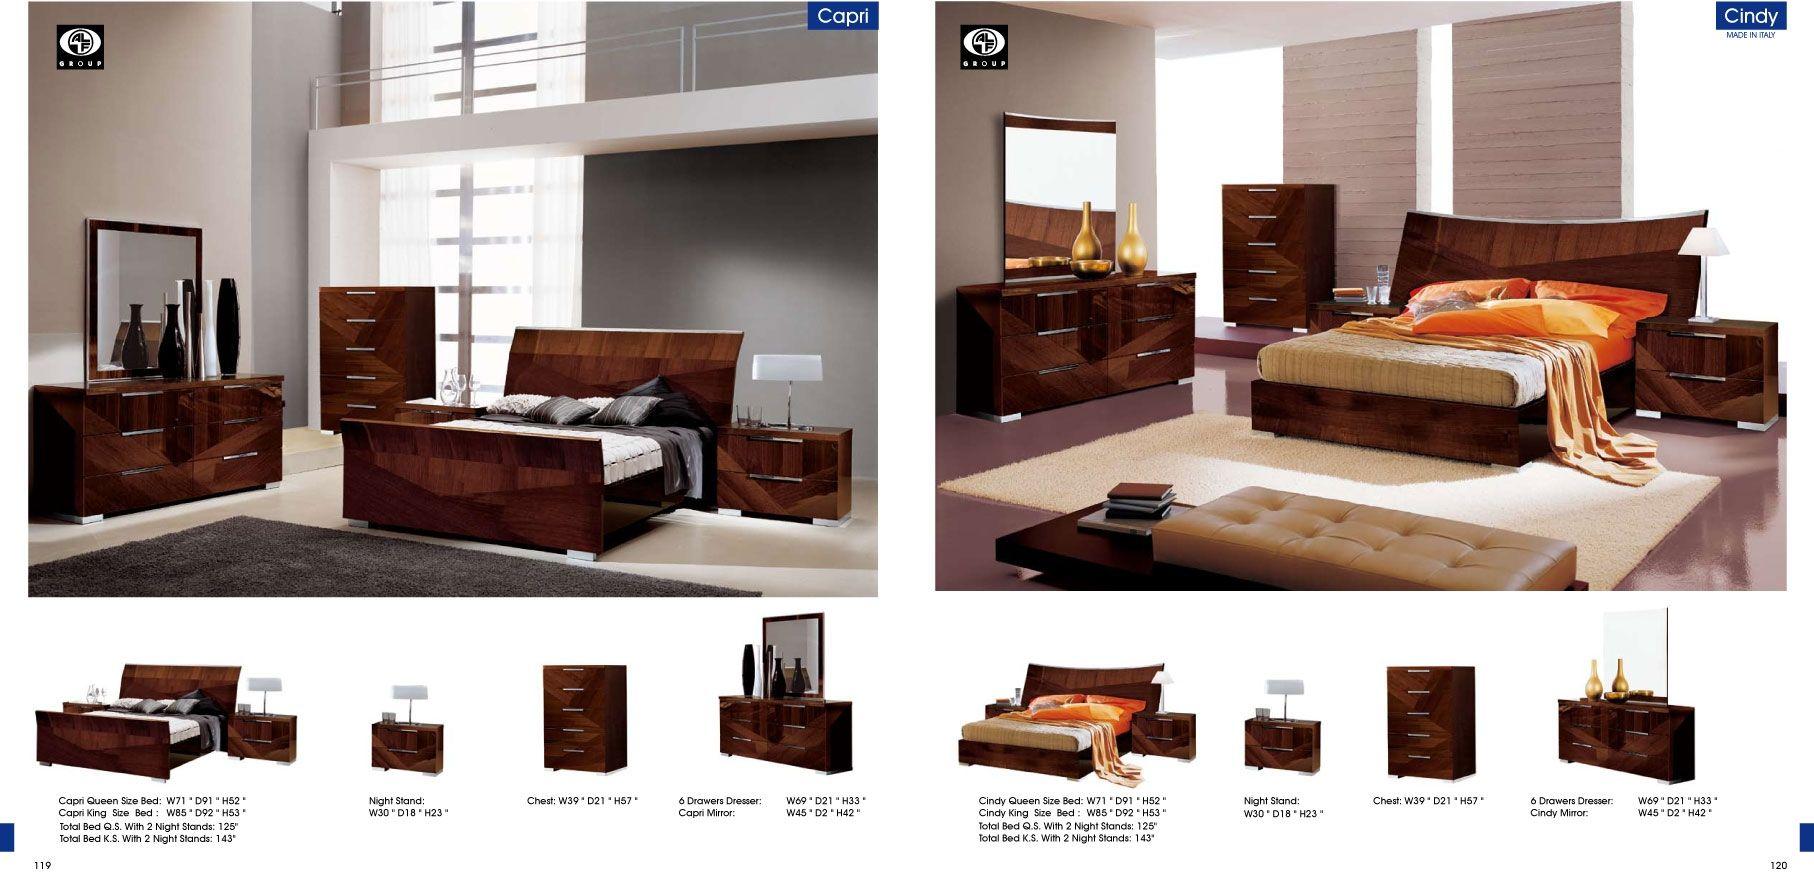 Capri bedroom furniture bedroom furniture pinterest capri and